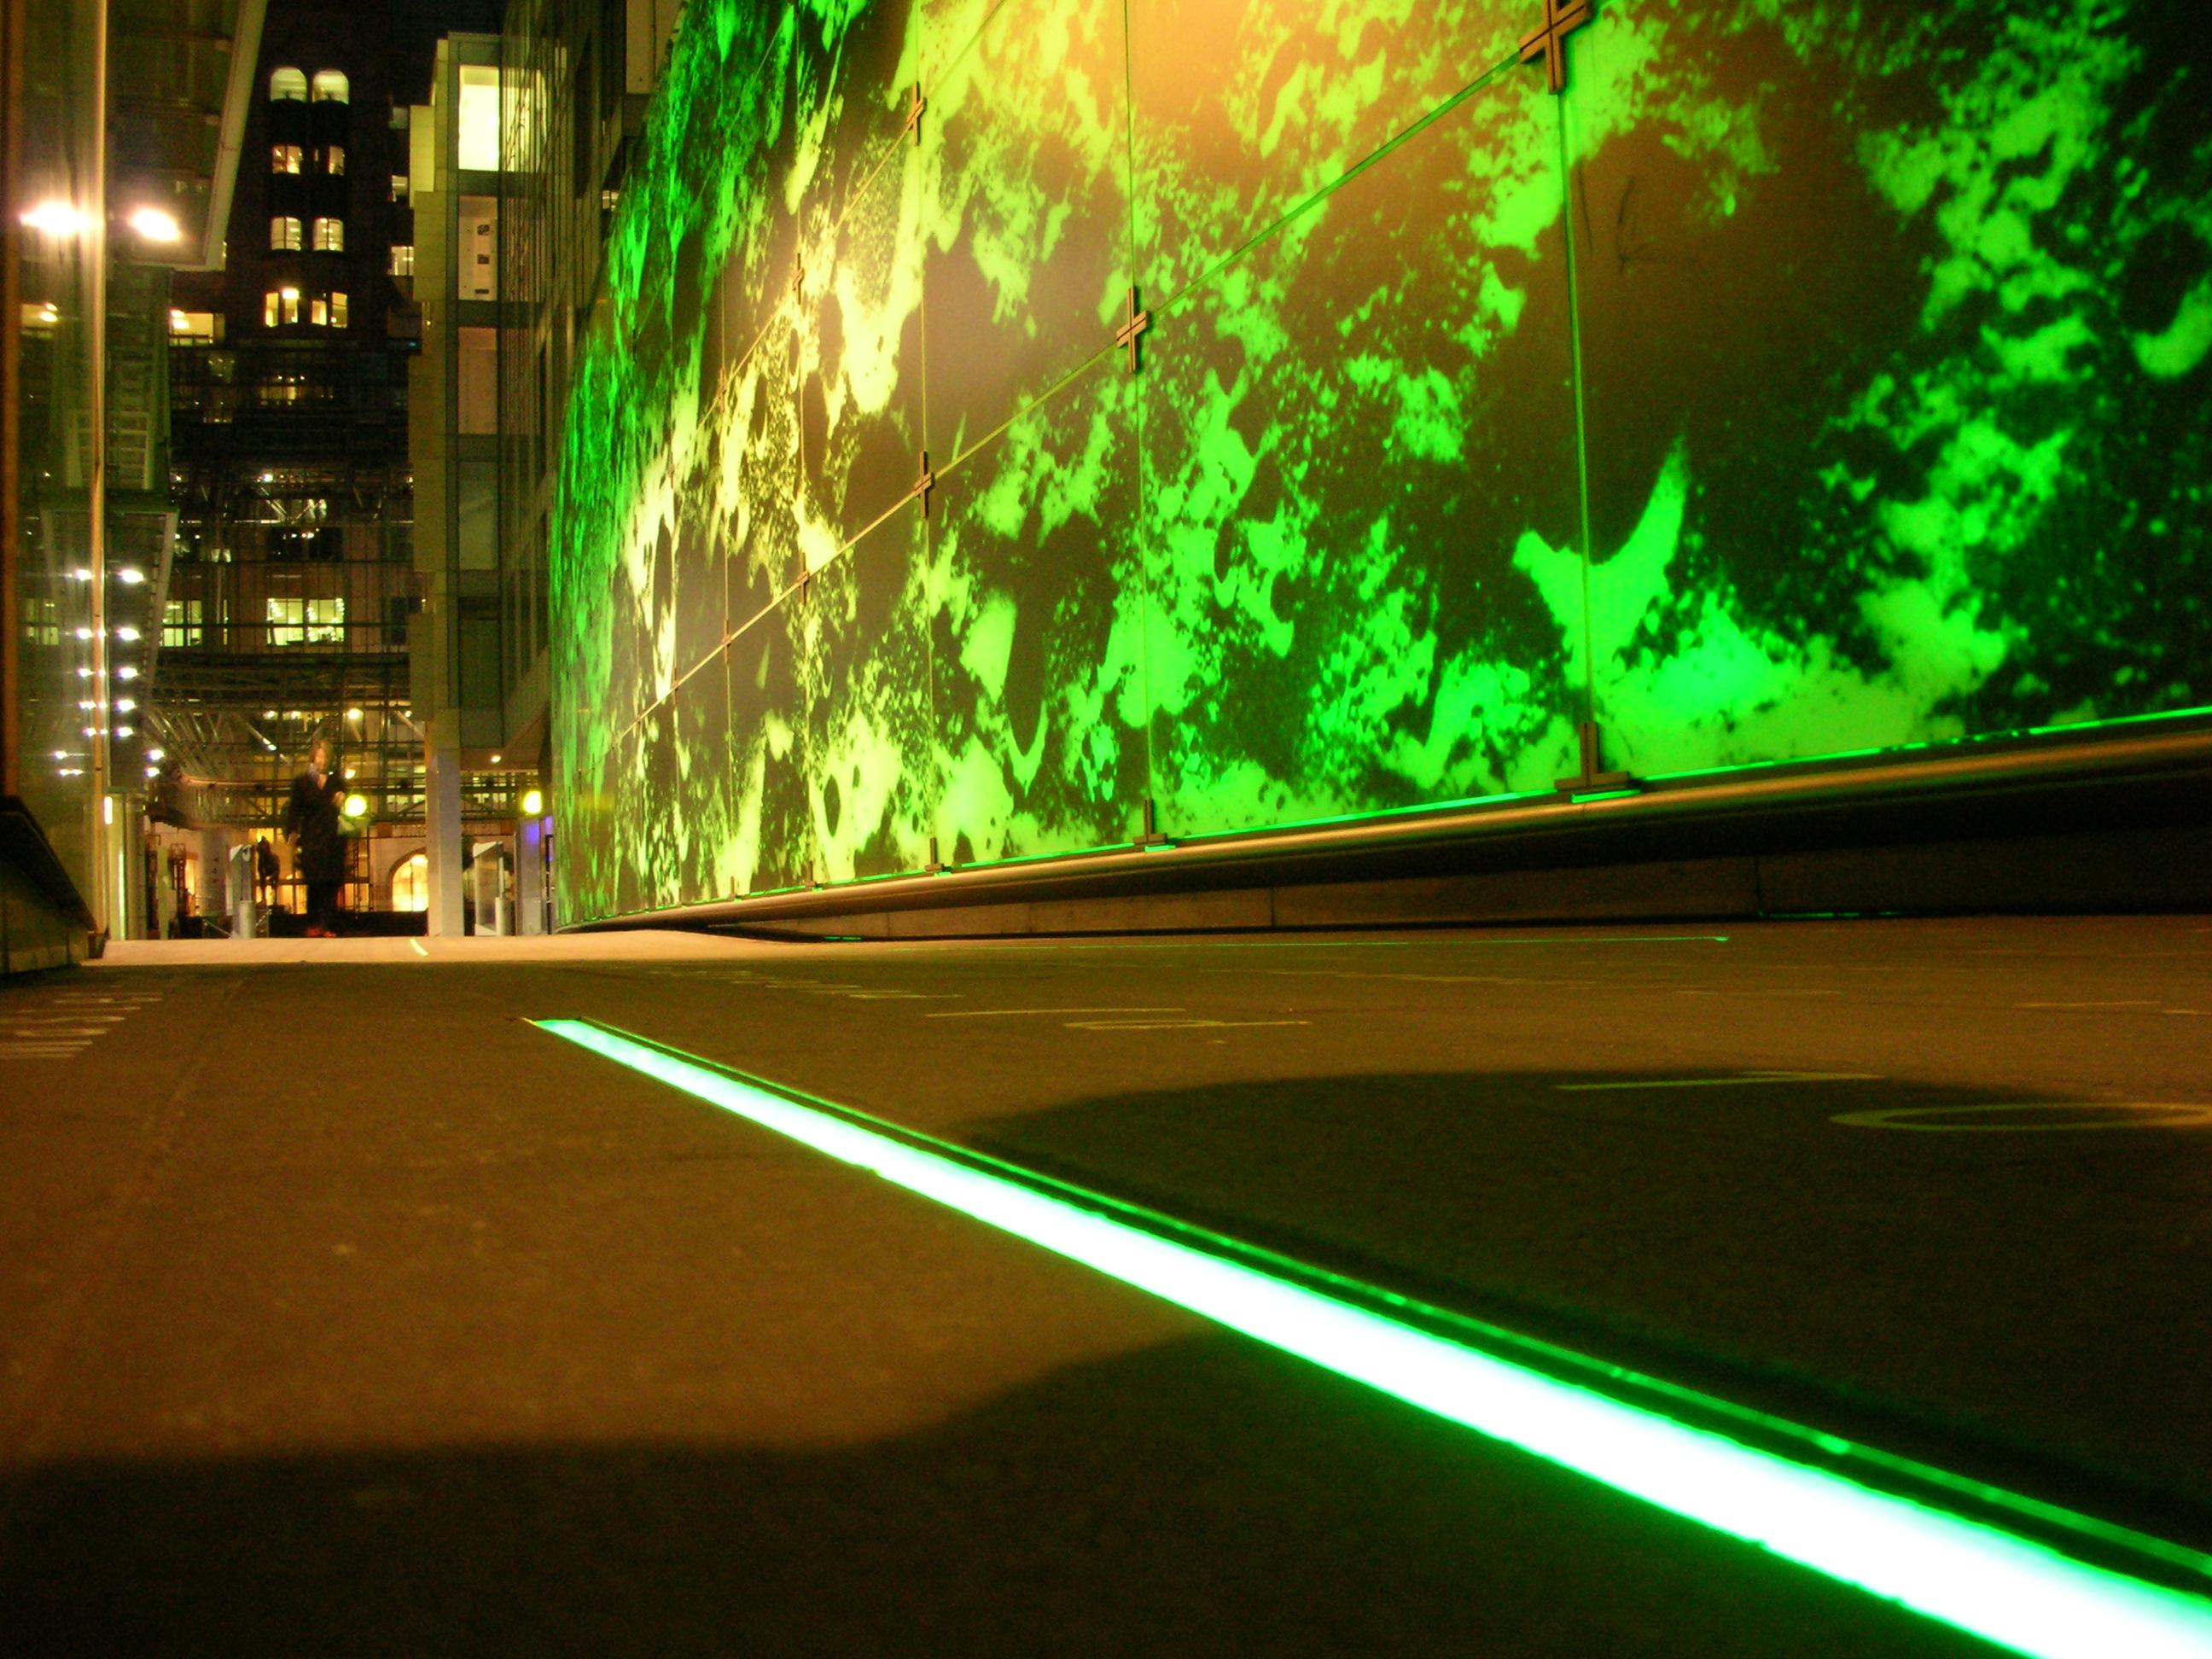 plantation-lane-london-moon-print-on-glass-panel-back-lit-green-and-ground-light